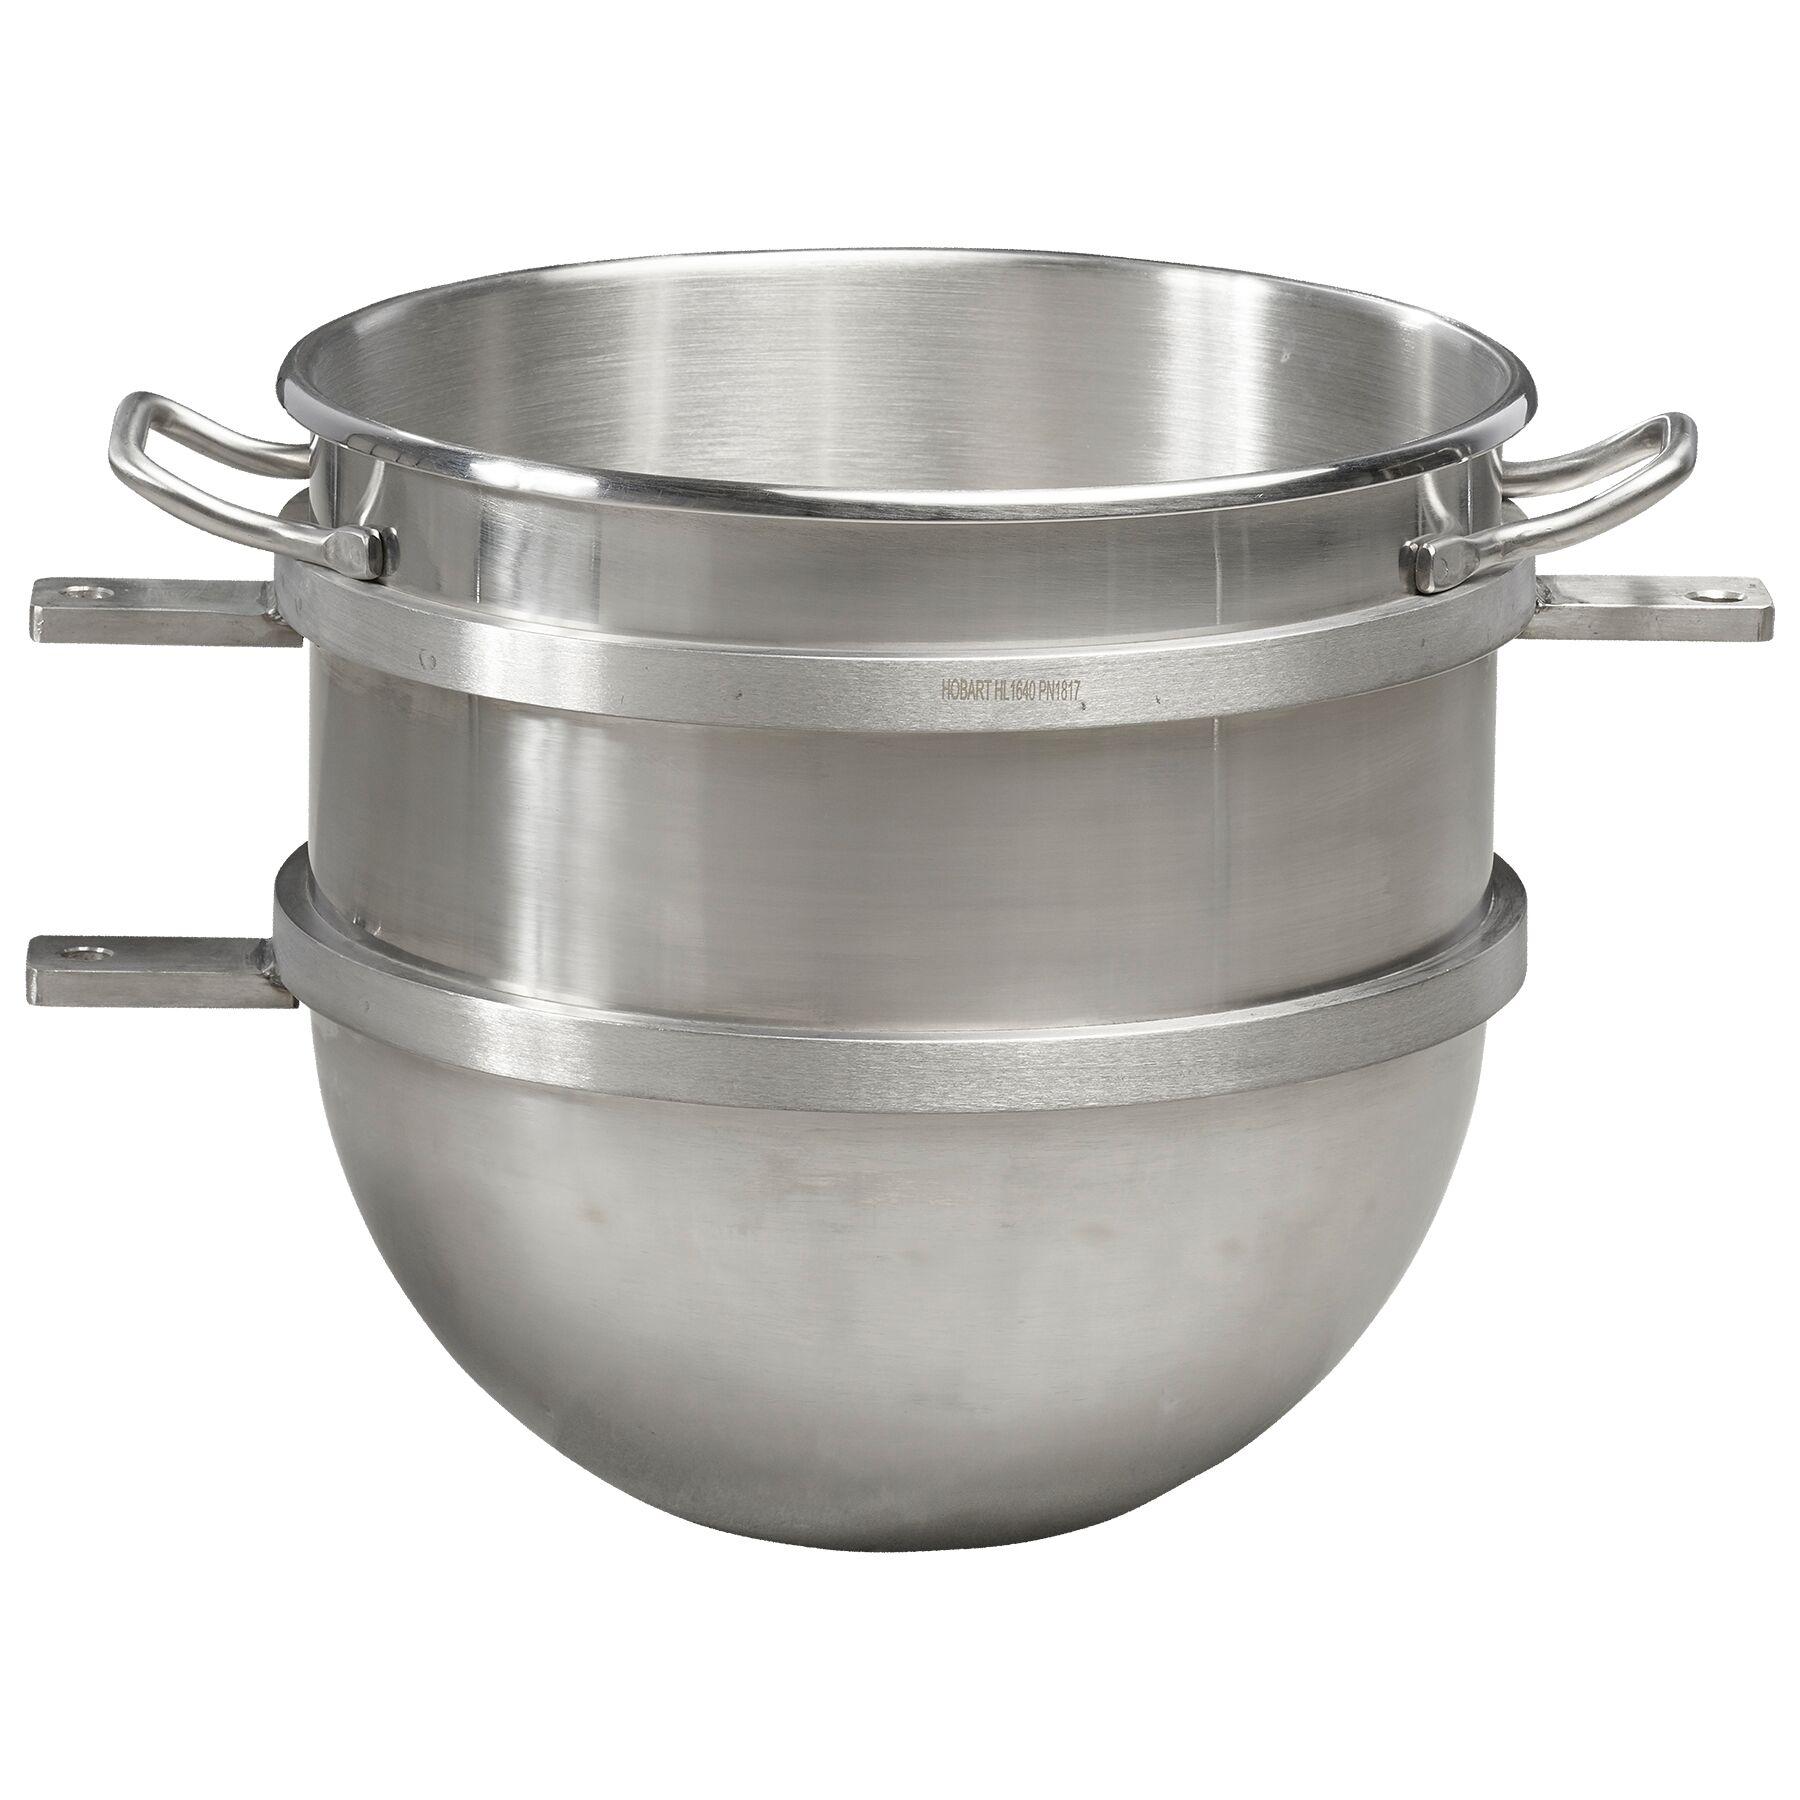 Hobart BOWL-HL1486 mixer bowl